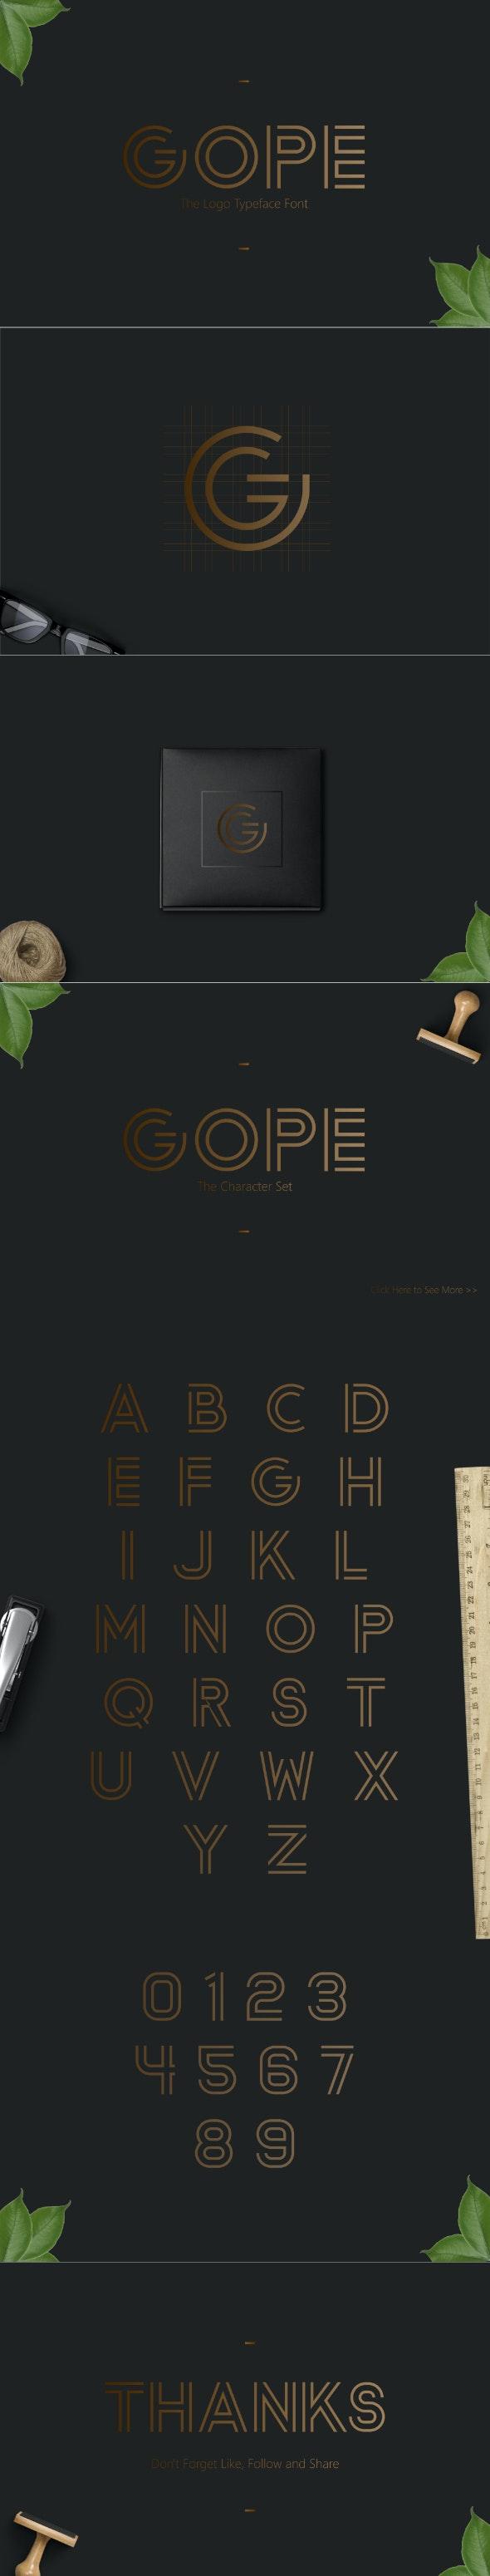 Gope Typeface - Monospaced Sans-Serif